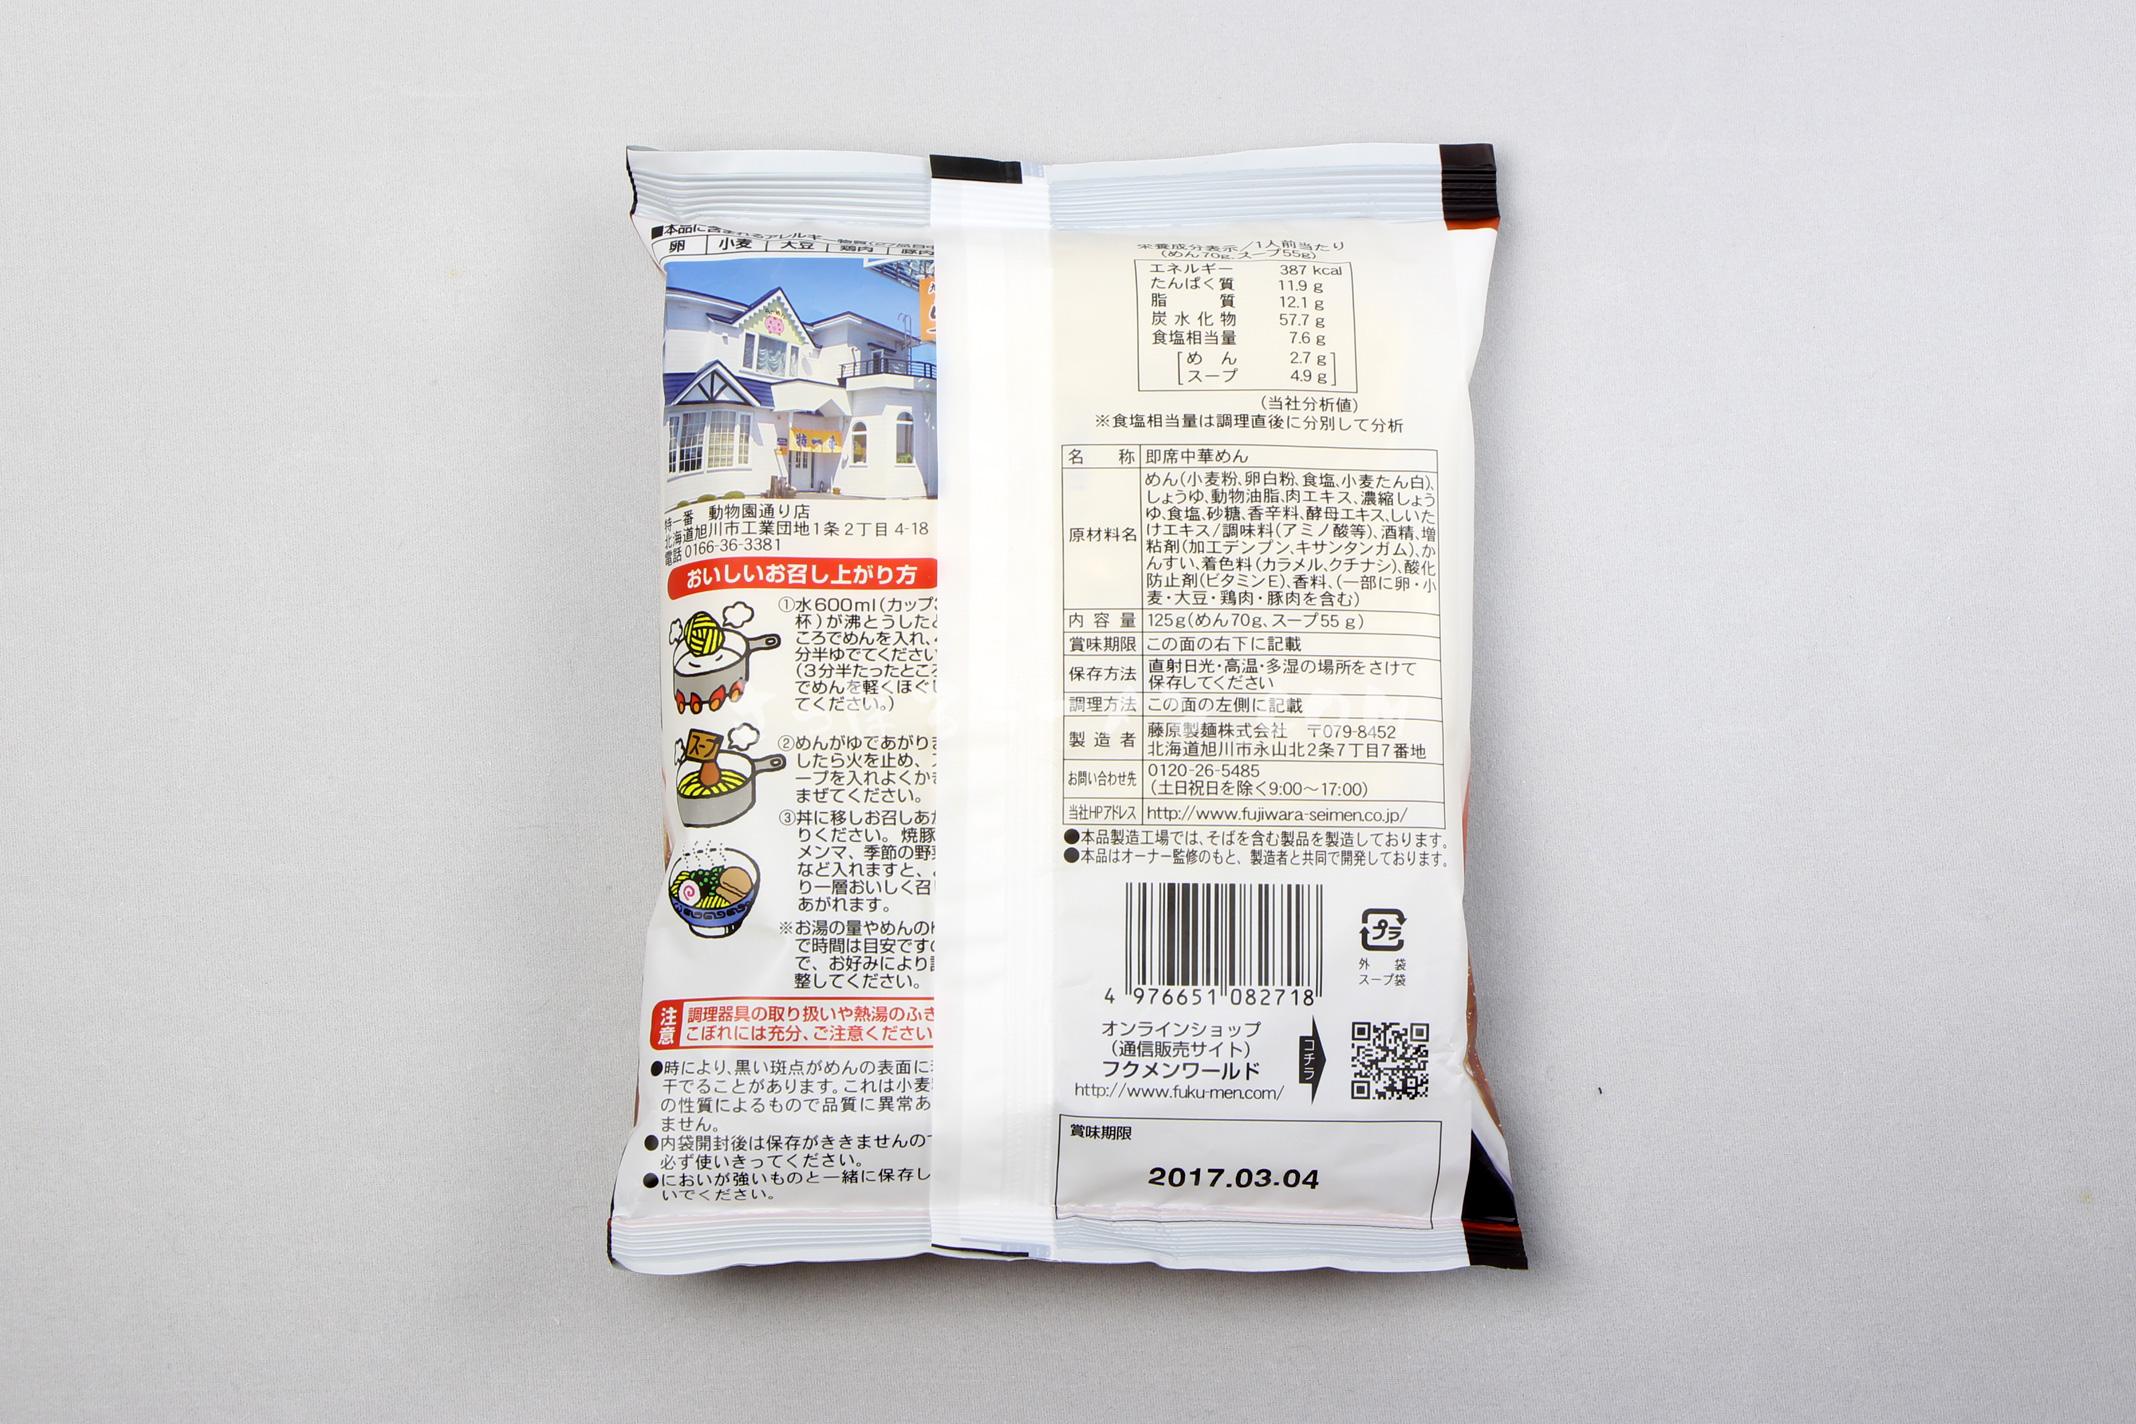 「旭川特一番 濃旨旭川醤油味」(藤原製麺)のパッケージ(裏)